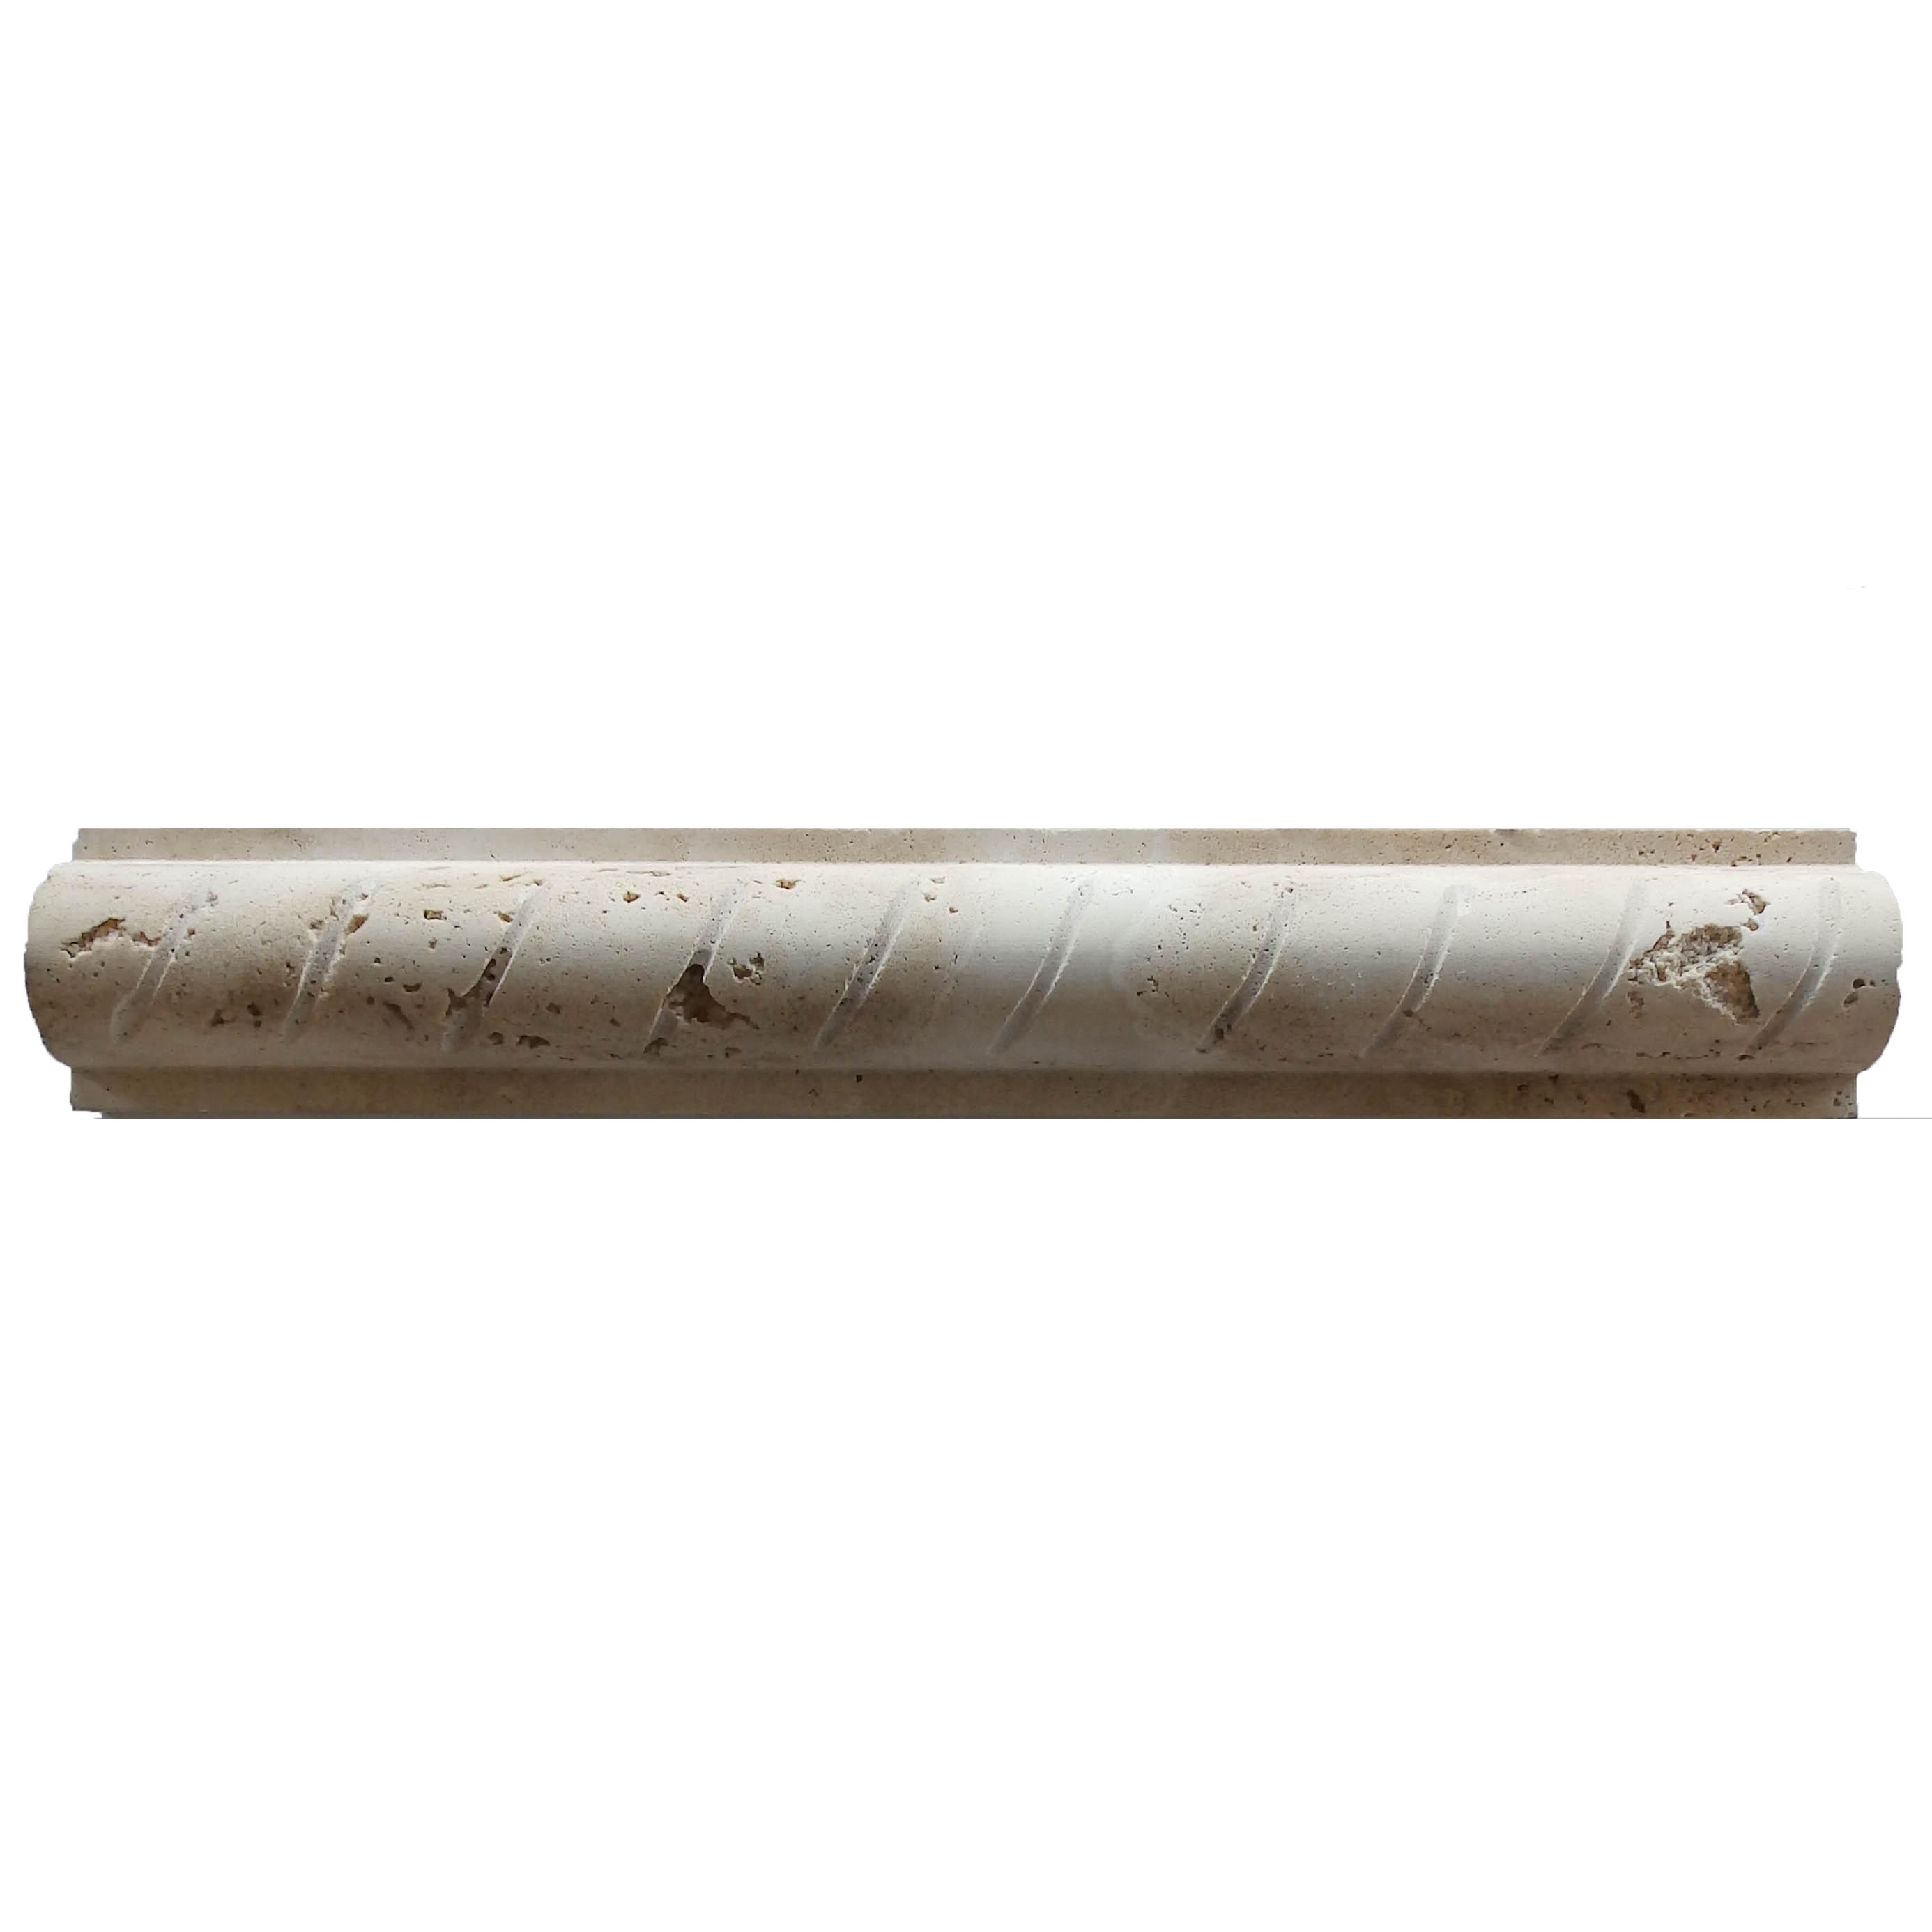 Item #6164 - Rustic Travertine Rope Molding Image